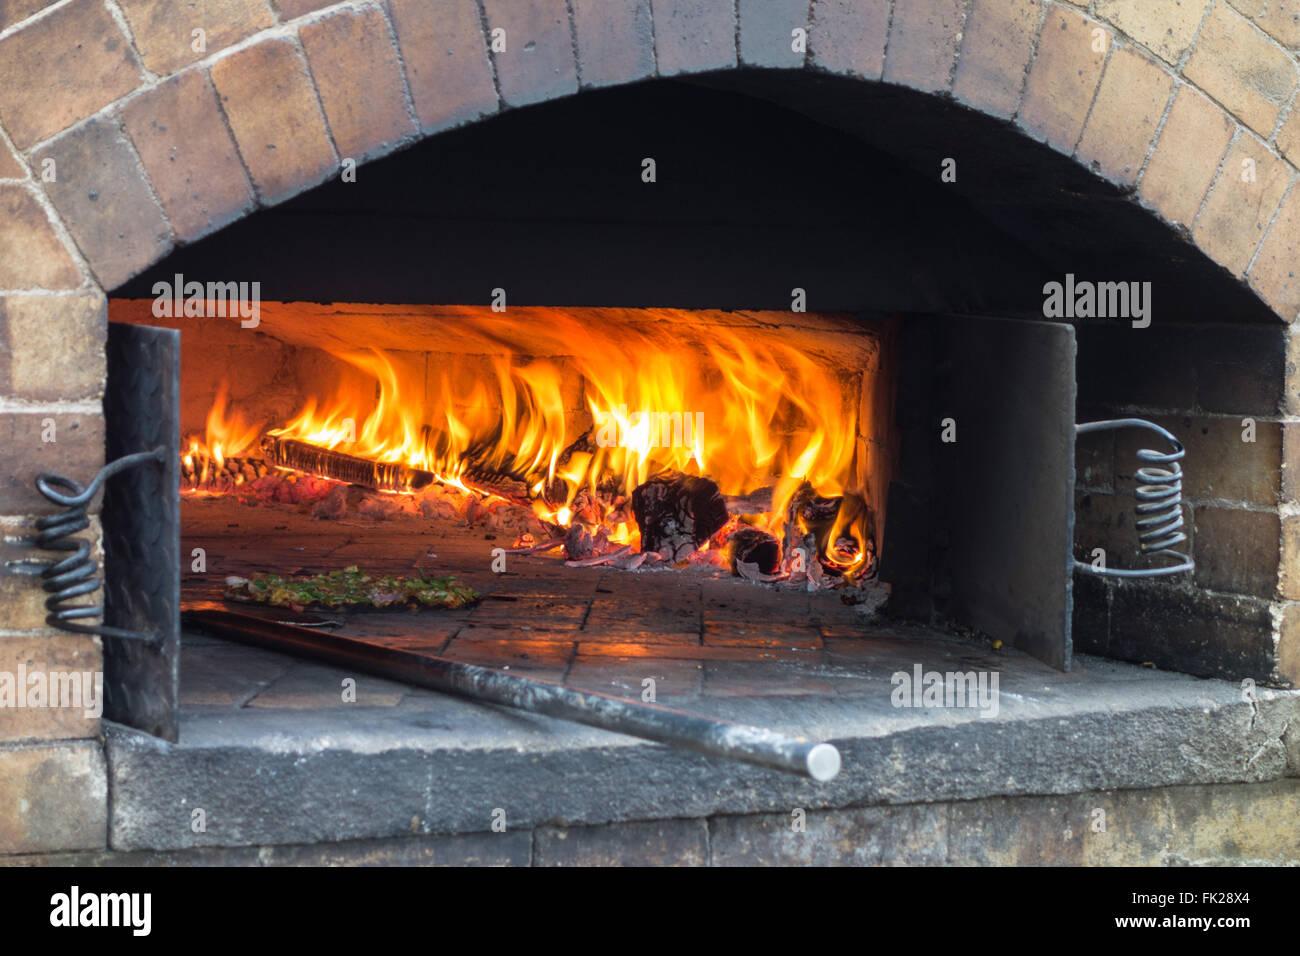 Panchgani photos around panchgani images panchgani temple photos - Close Up Of The Firewood Oven Used To Bake Pizza At Mapro Garden Panchgani